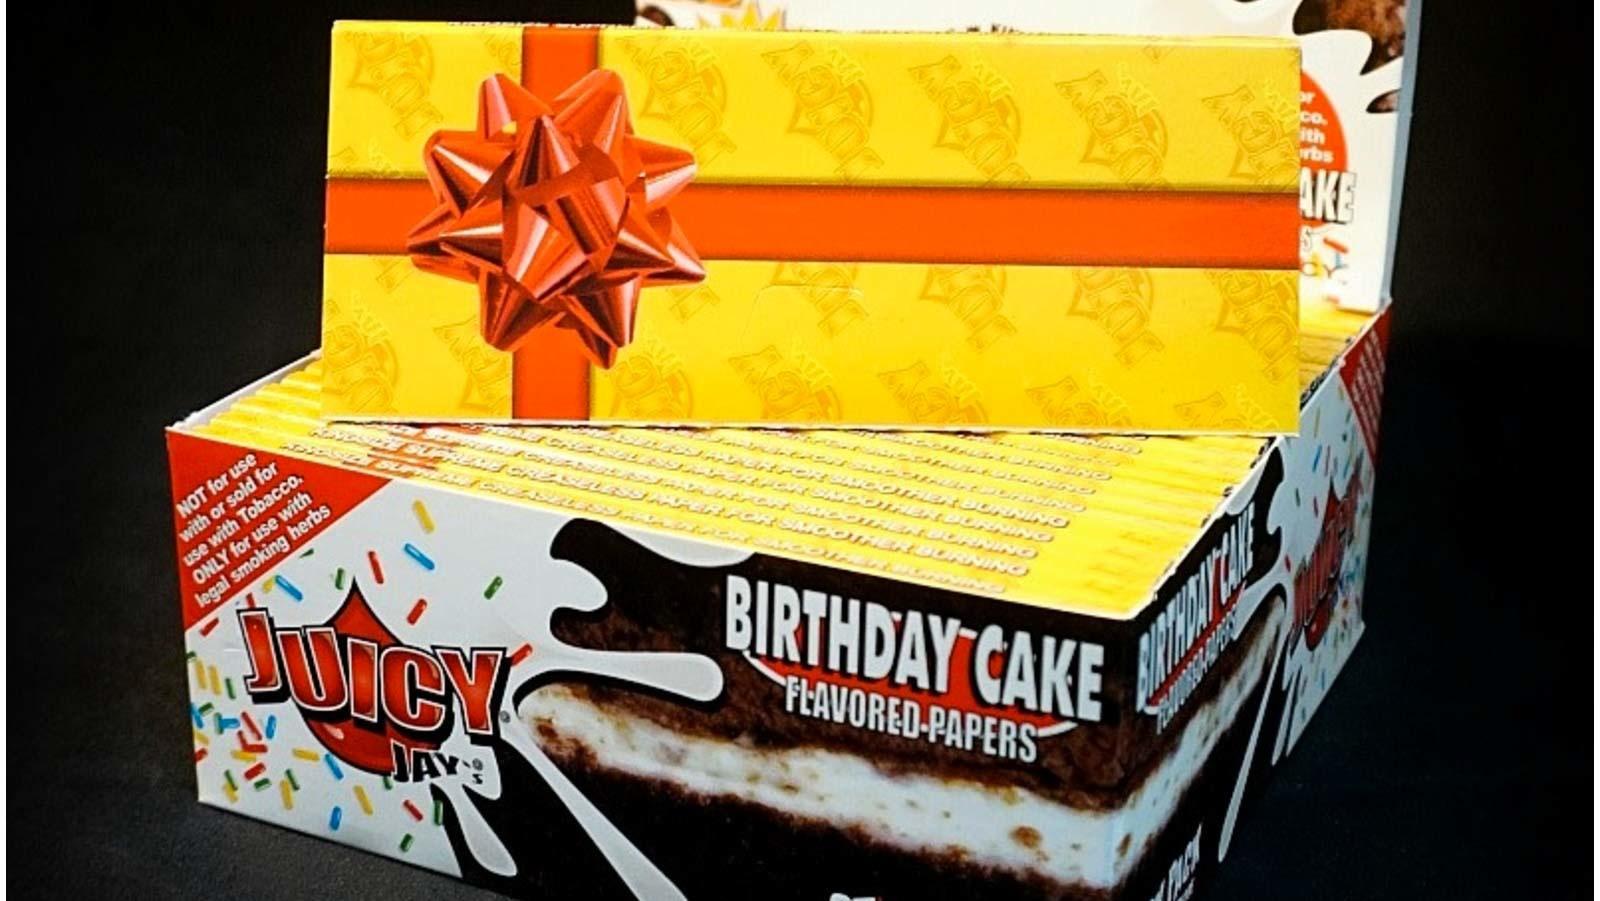 Juicy Jays Papers Birthday Cake KS